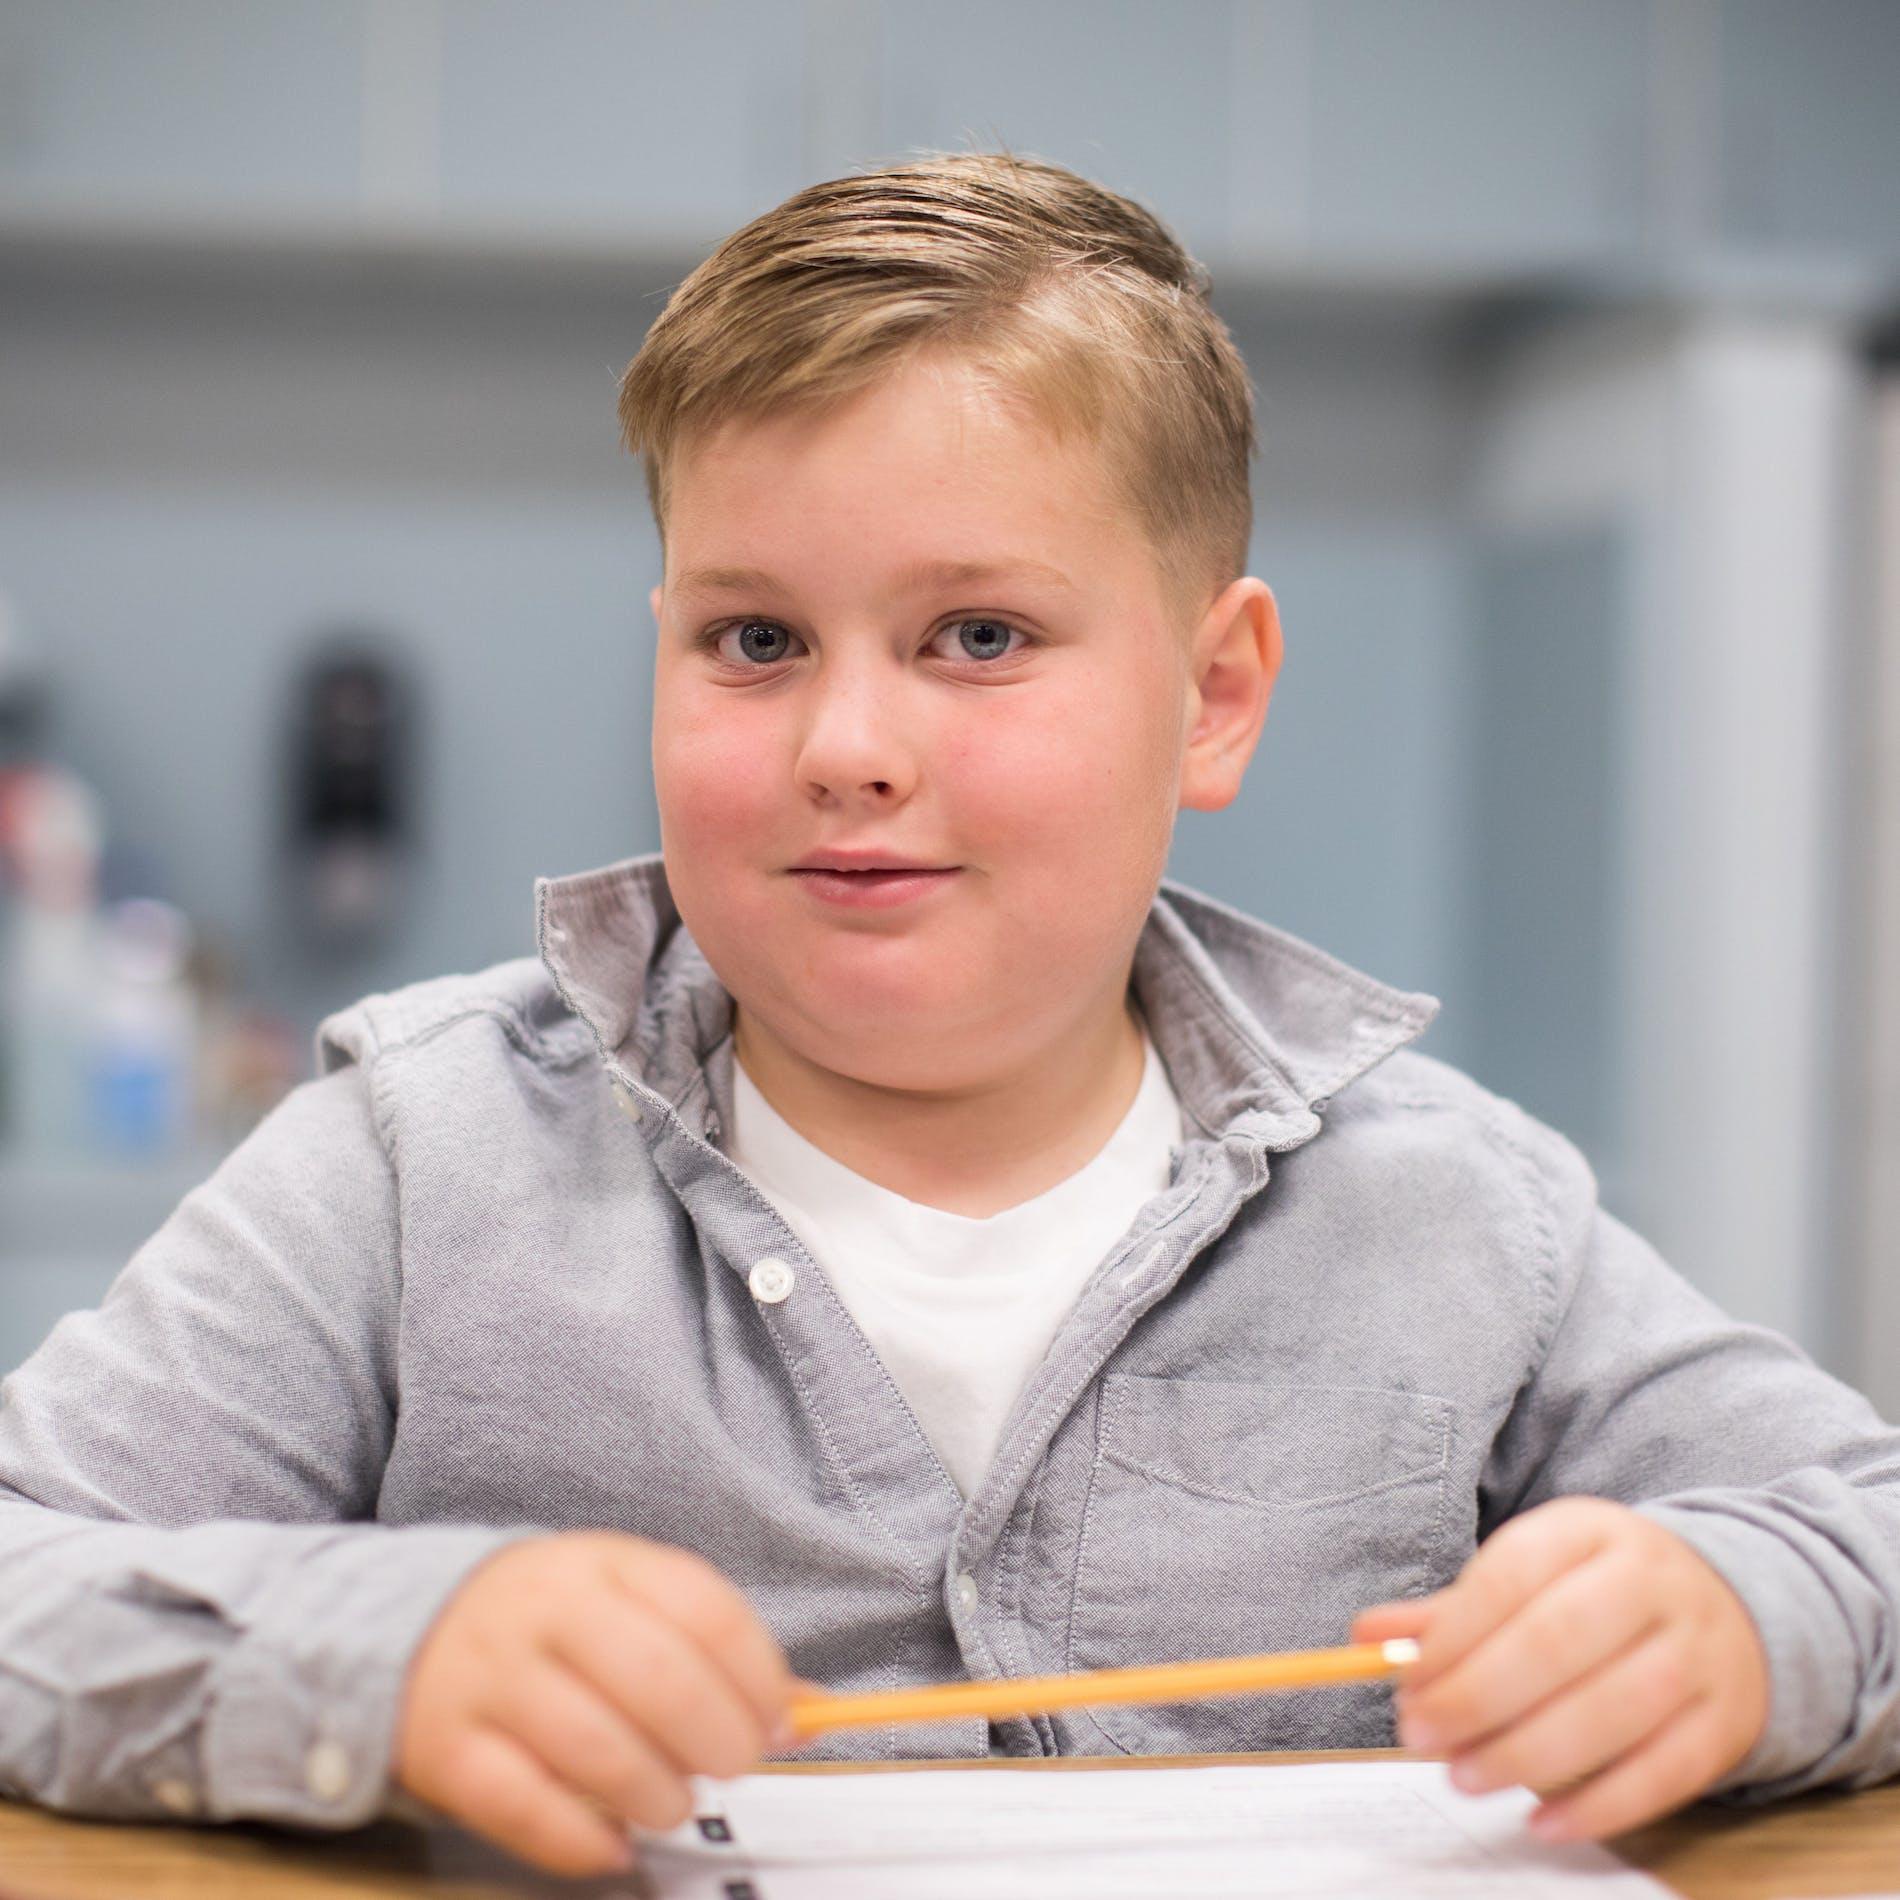 Pensive boy holding pencil.